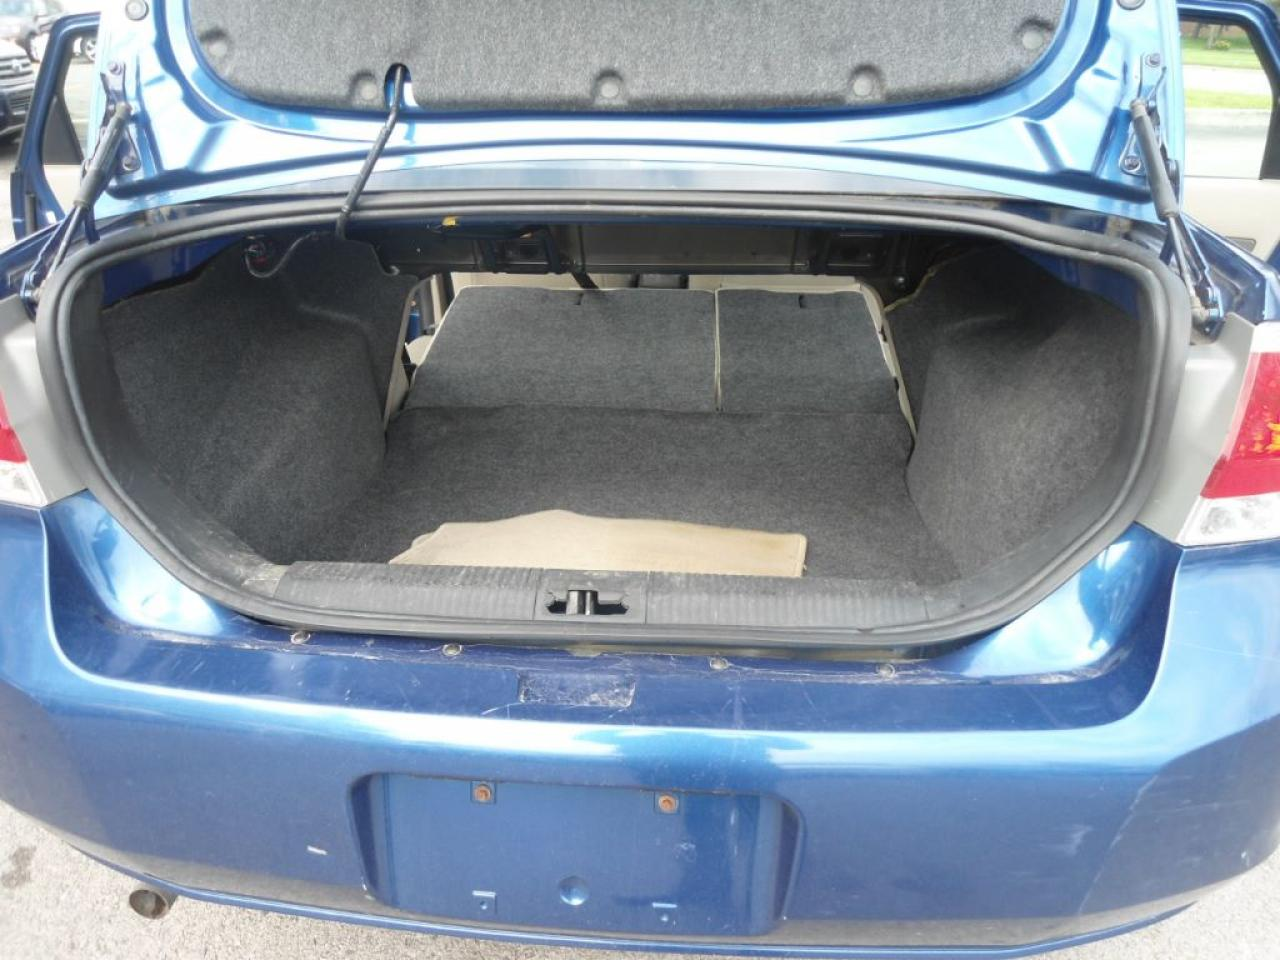 2008 Ford Focus 4dr Sdn SE AUTO PW PL PM SAFETY WARRATNY